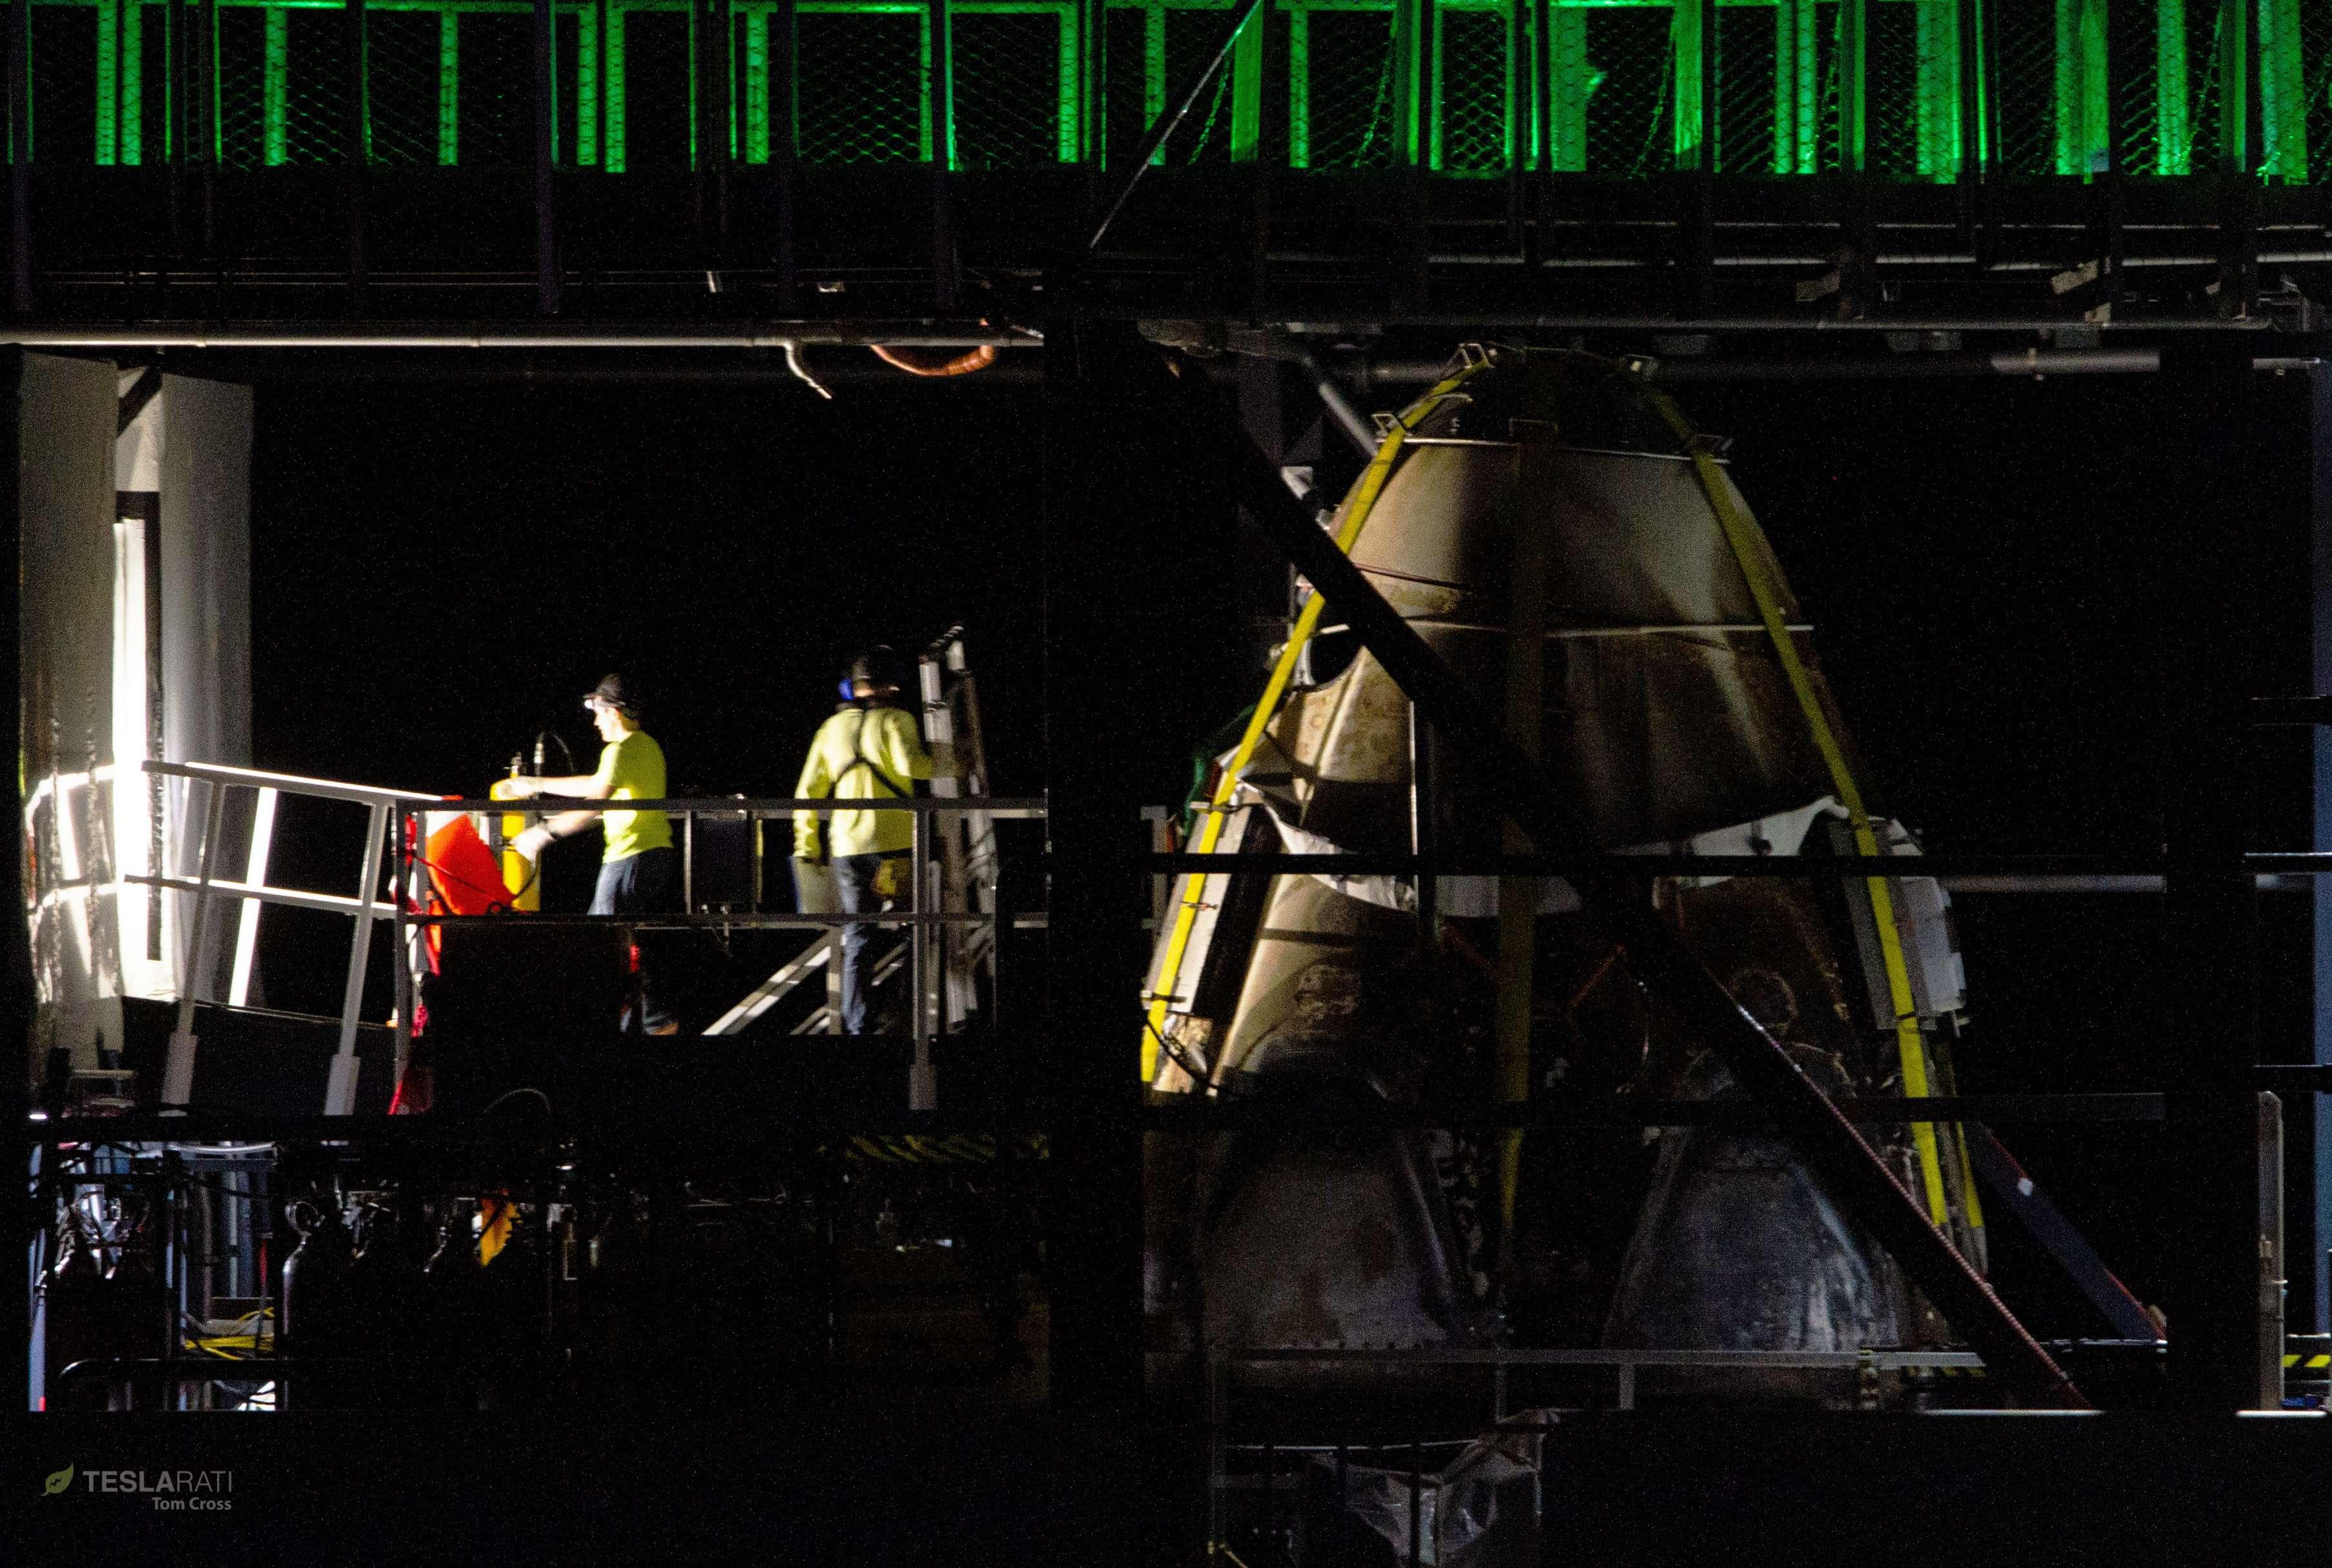 Crew Dragon DM-1 capsule port return 031019 (Tom Cross) detail 7 (c)